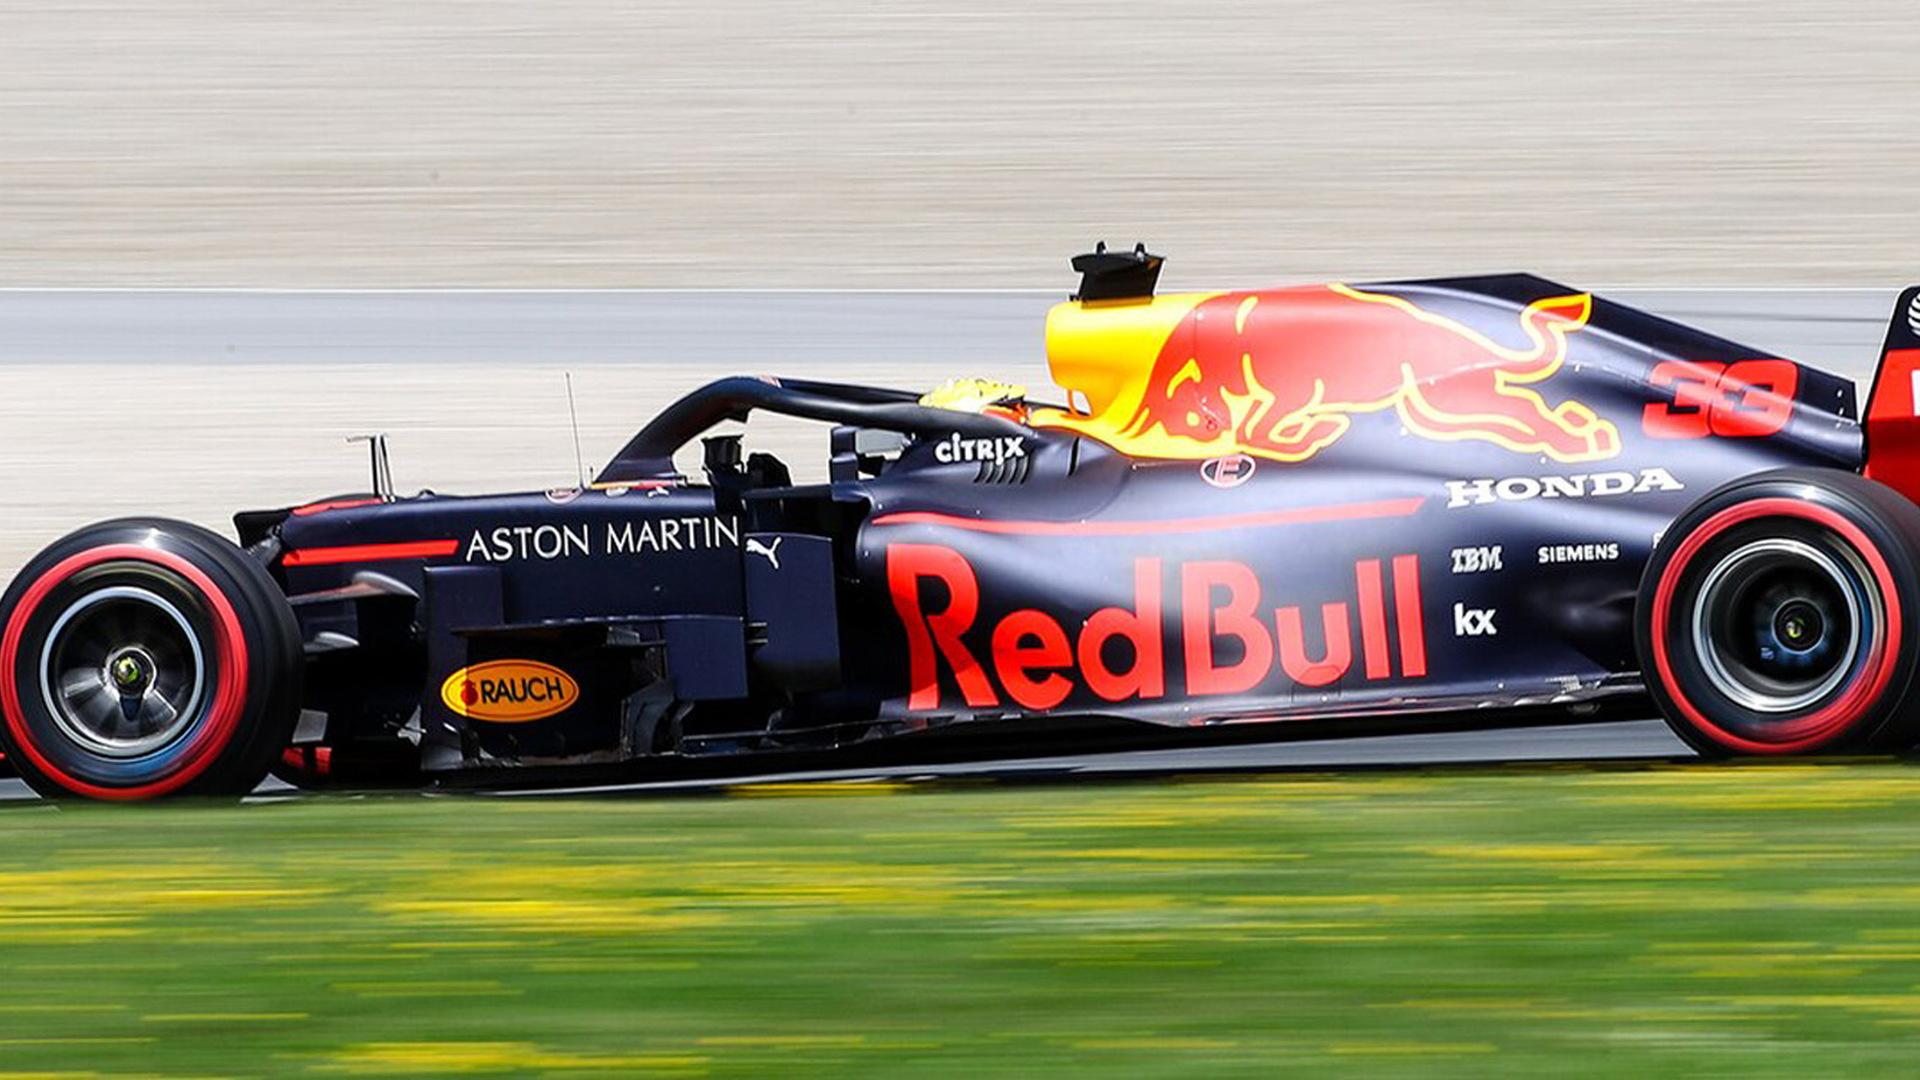 Aston Martin Red Bull Racing's Max Verstappen at the 2019 Formula One Austrian Grand Prix